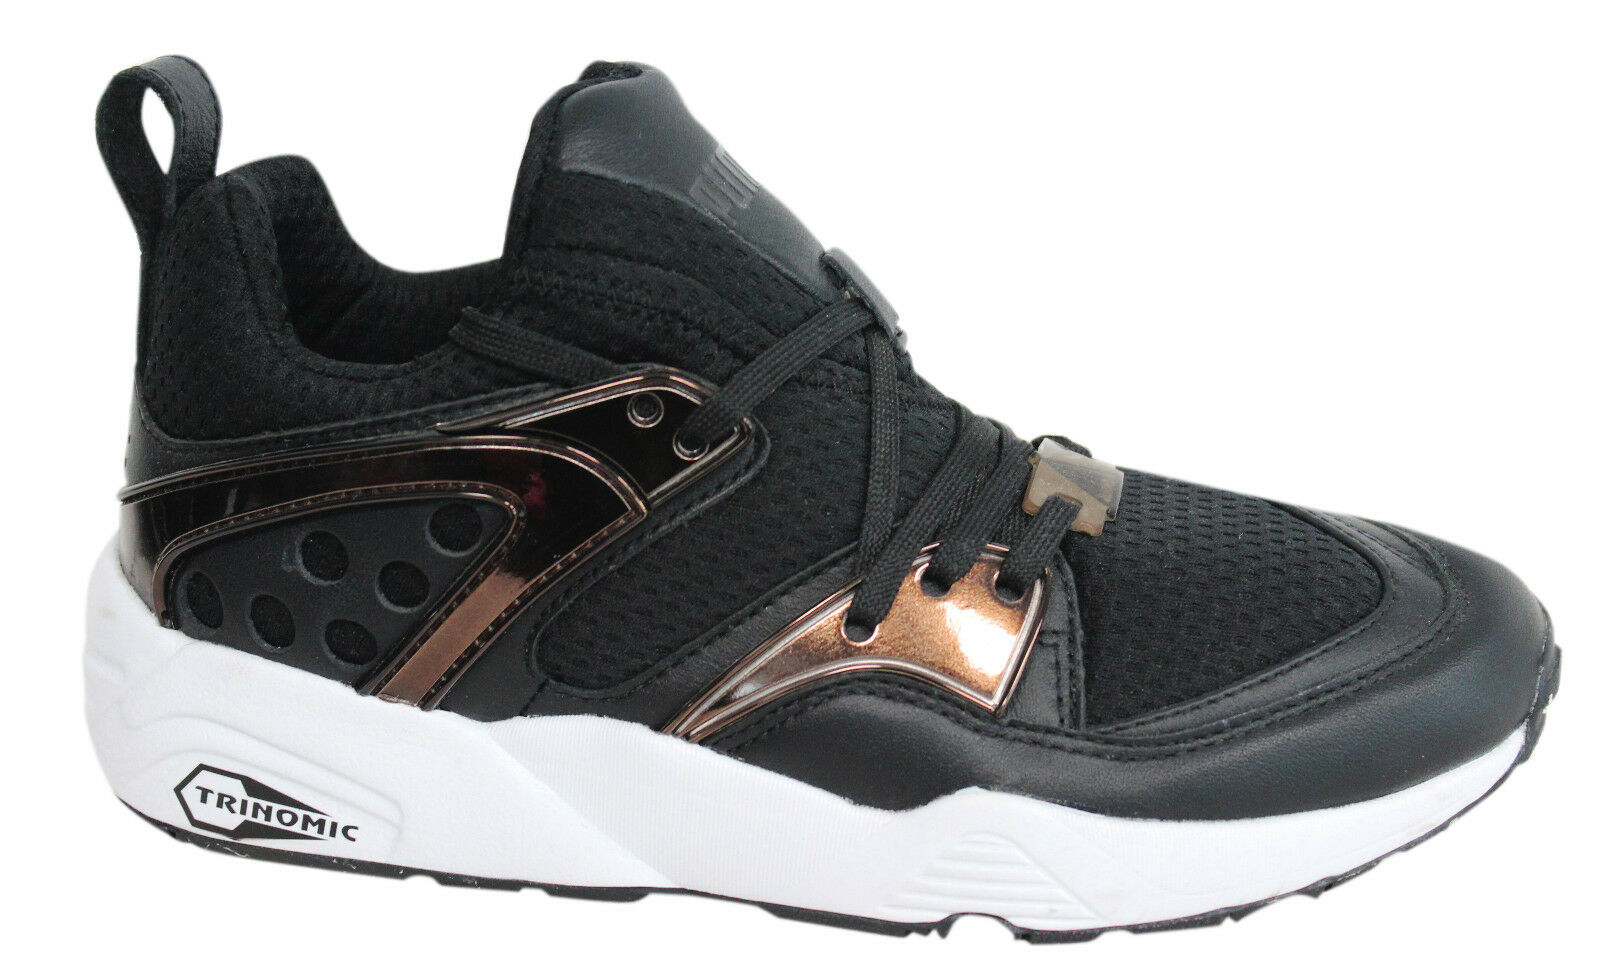 Puma Trinomic Of Blaze Of Trinomic Glory Metallic  Herren Trainers Lace Up Schuhes 361851 04 M3 c1a0c6